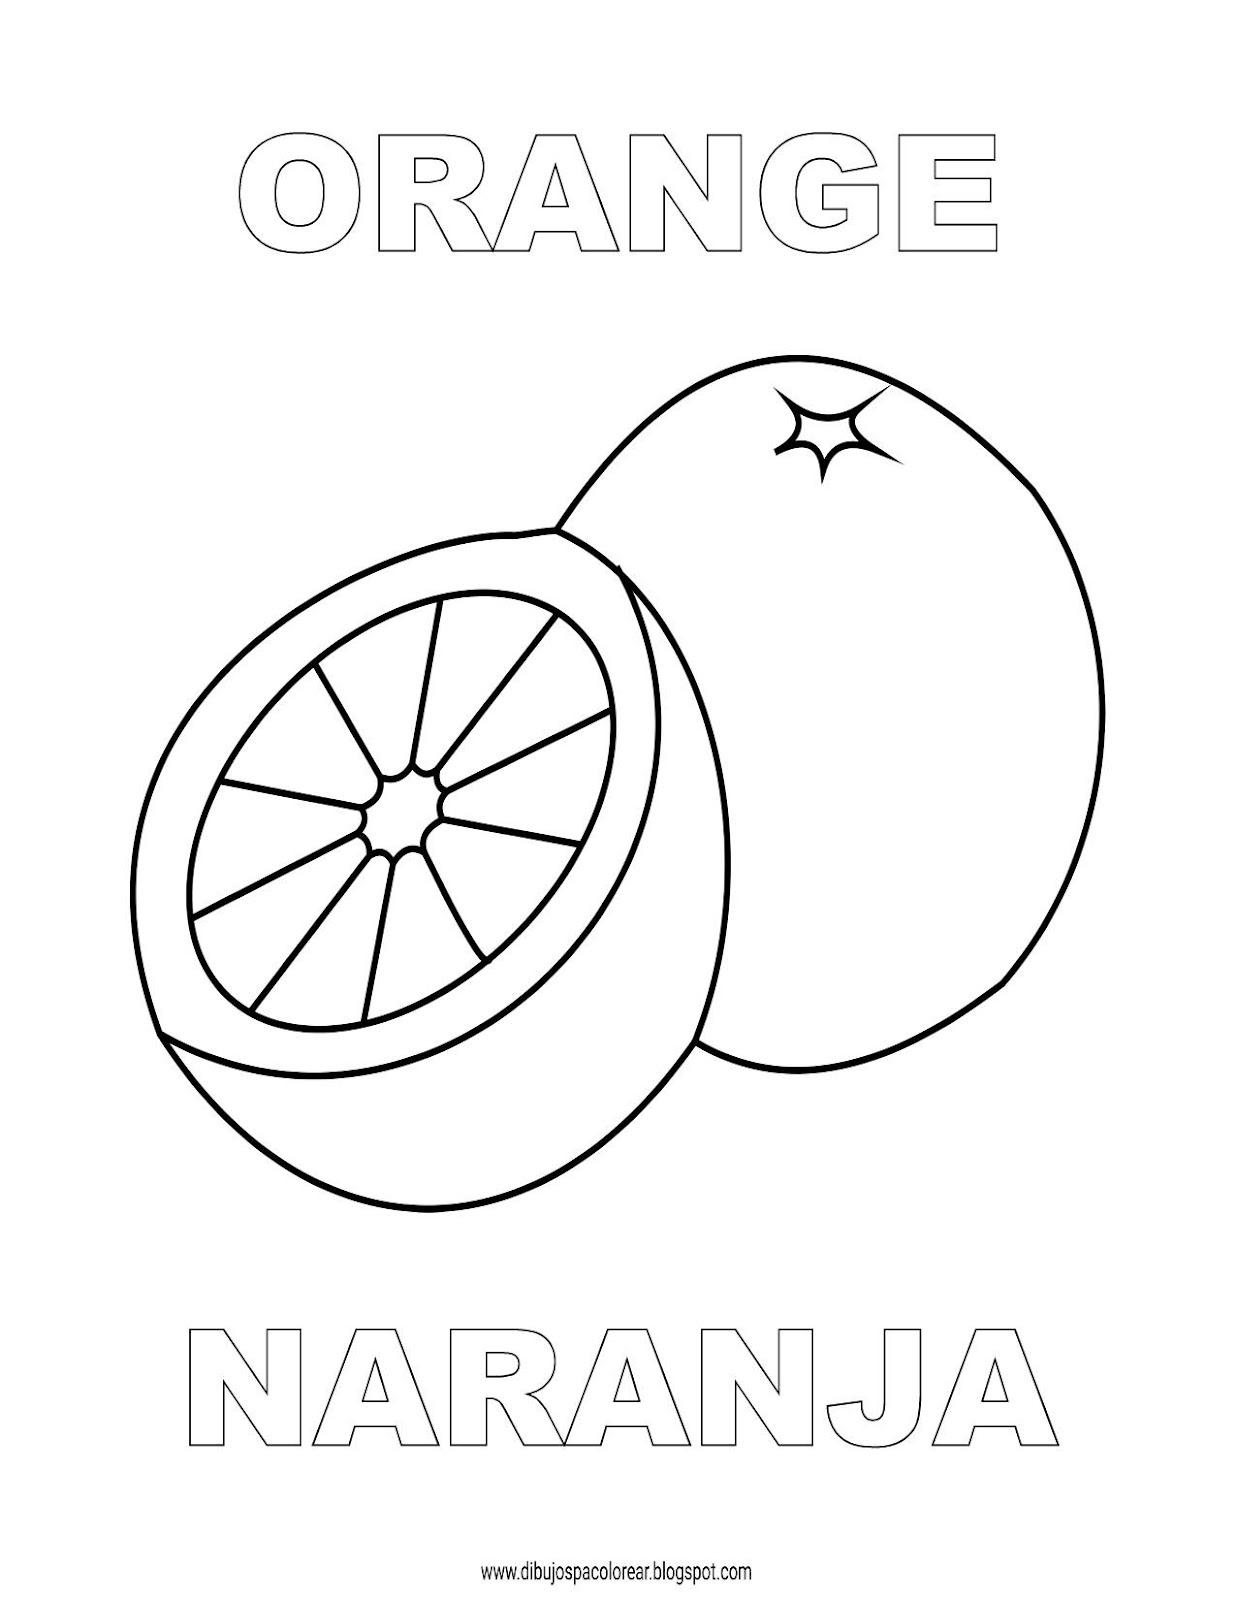 Dibujos Inglés Español Con N Naranja Orange Dibujospacolorear